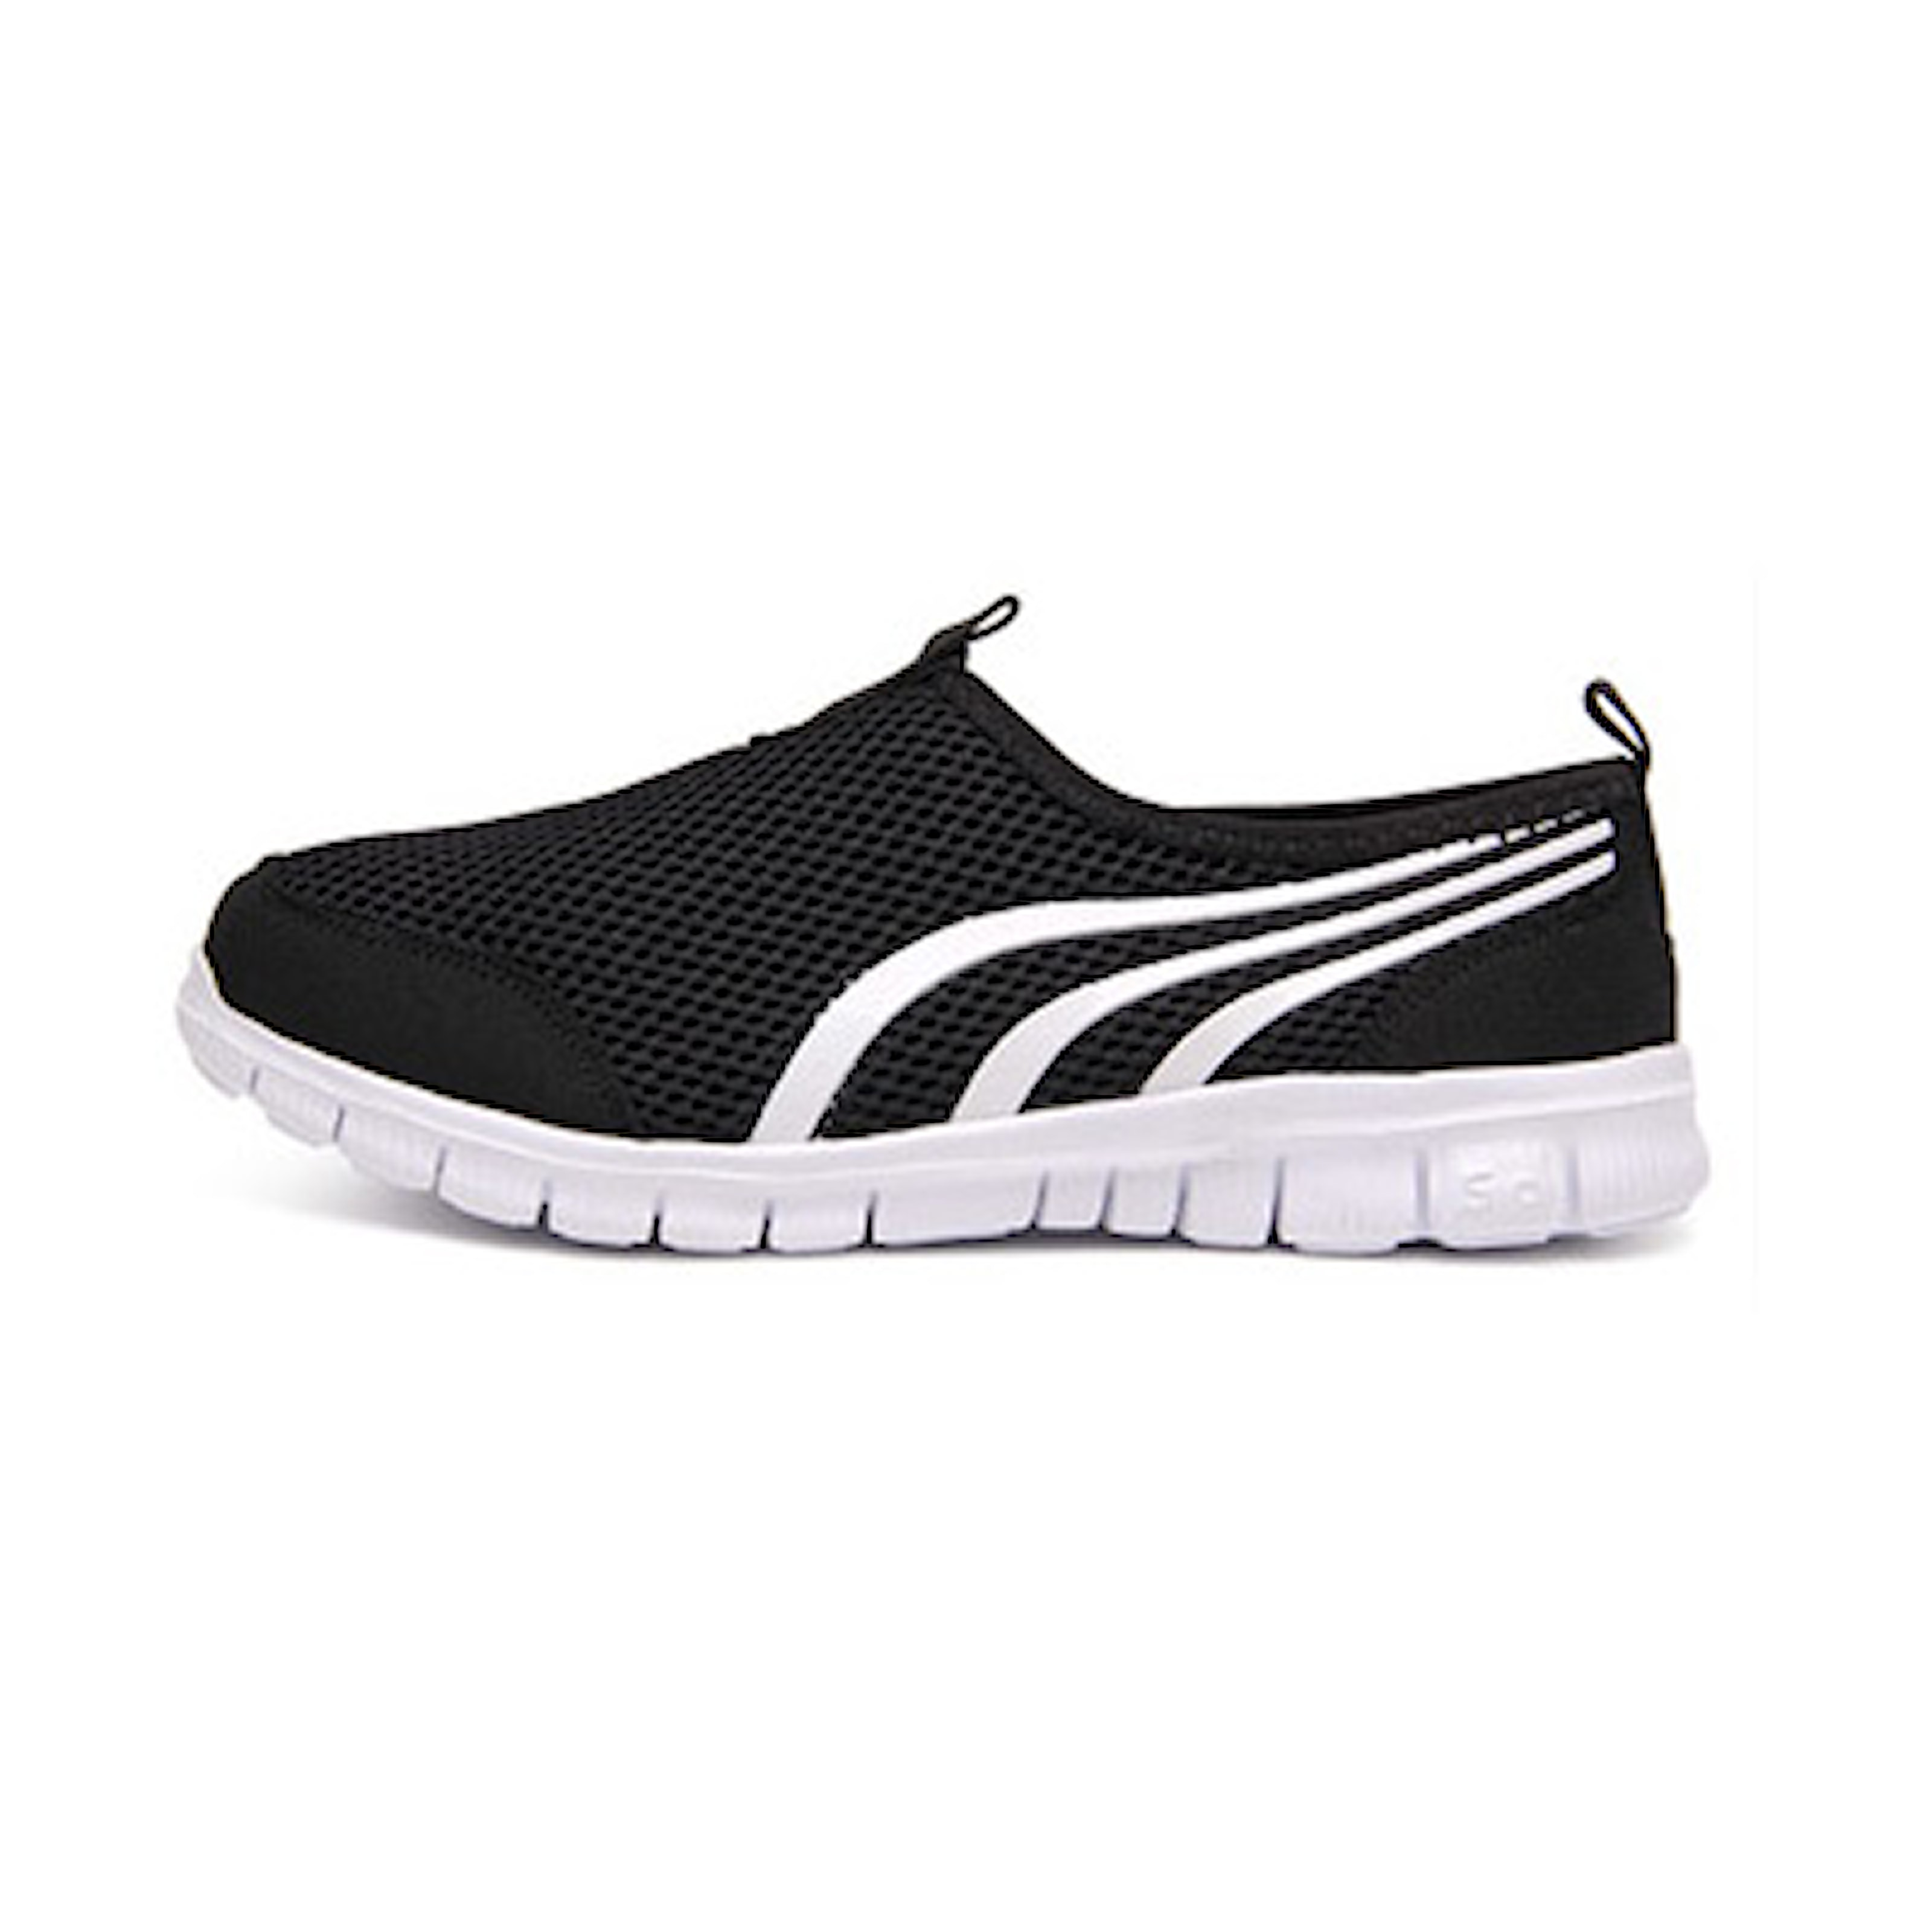 Svart, 37, Sporty Mesh Shoes, Sporty sko i mesh, ,